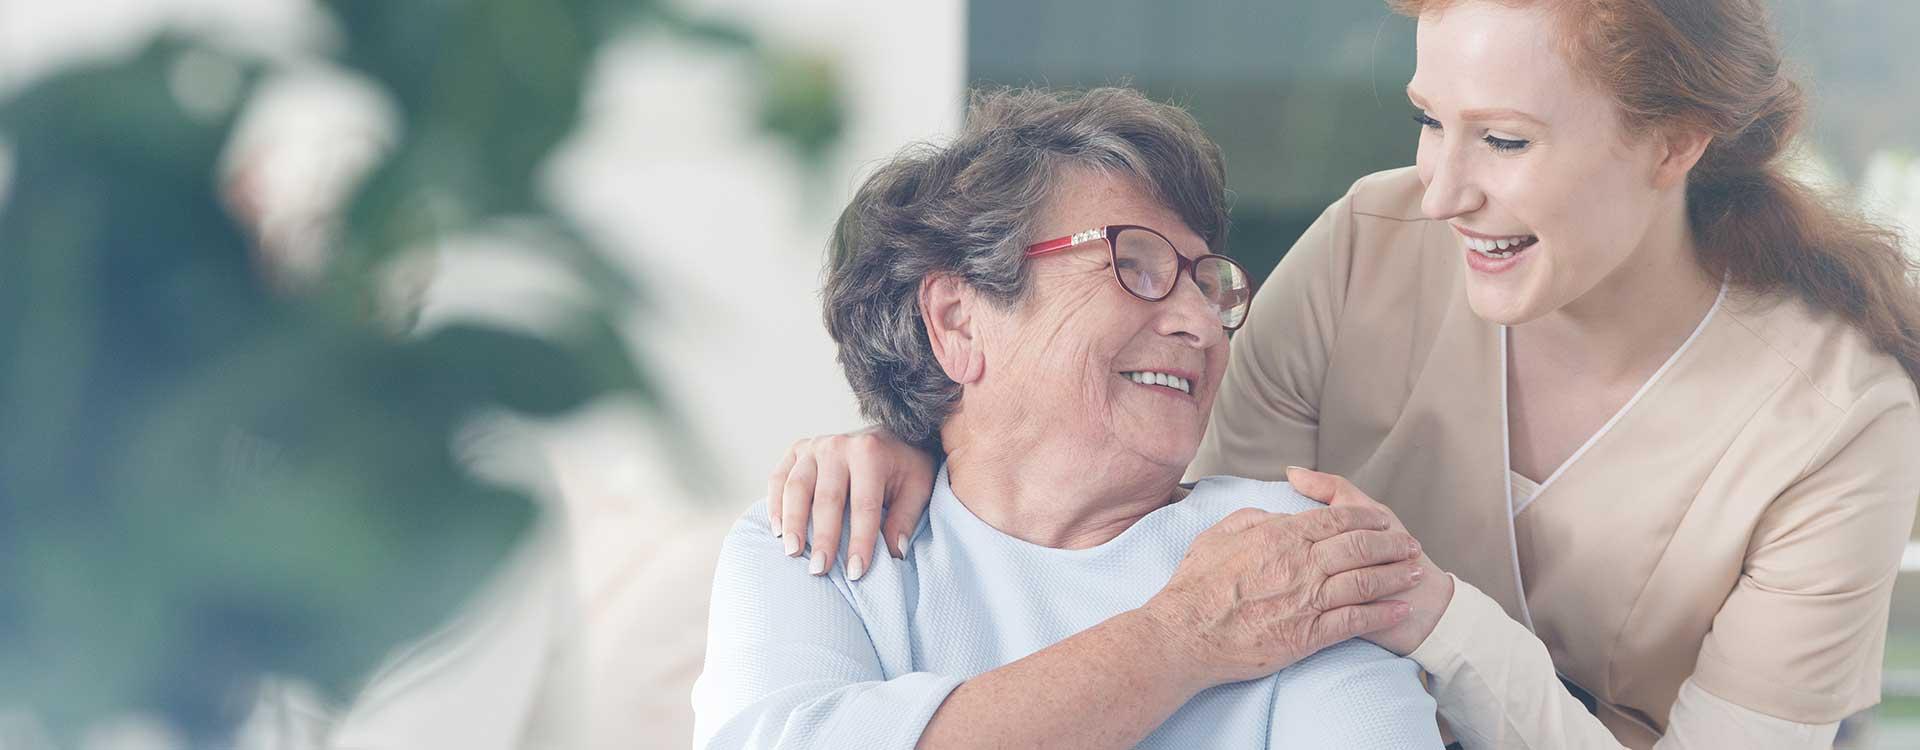 Das Pflegestärkungsgesetz